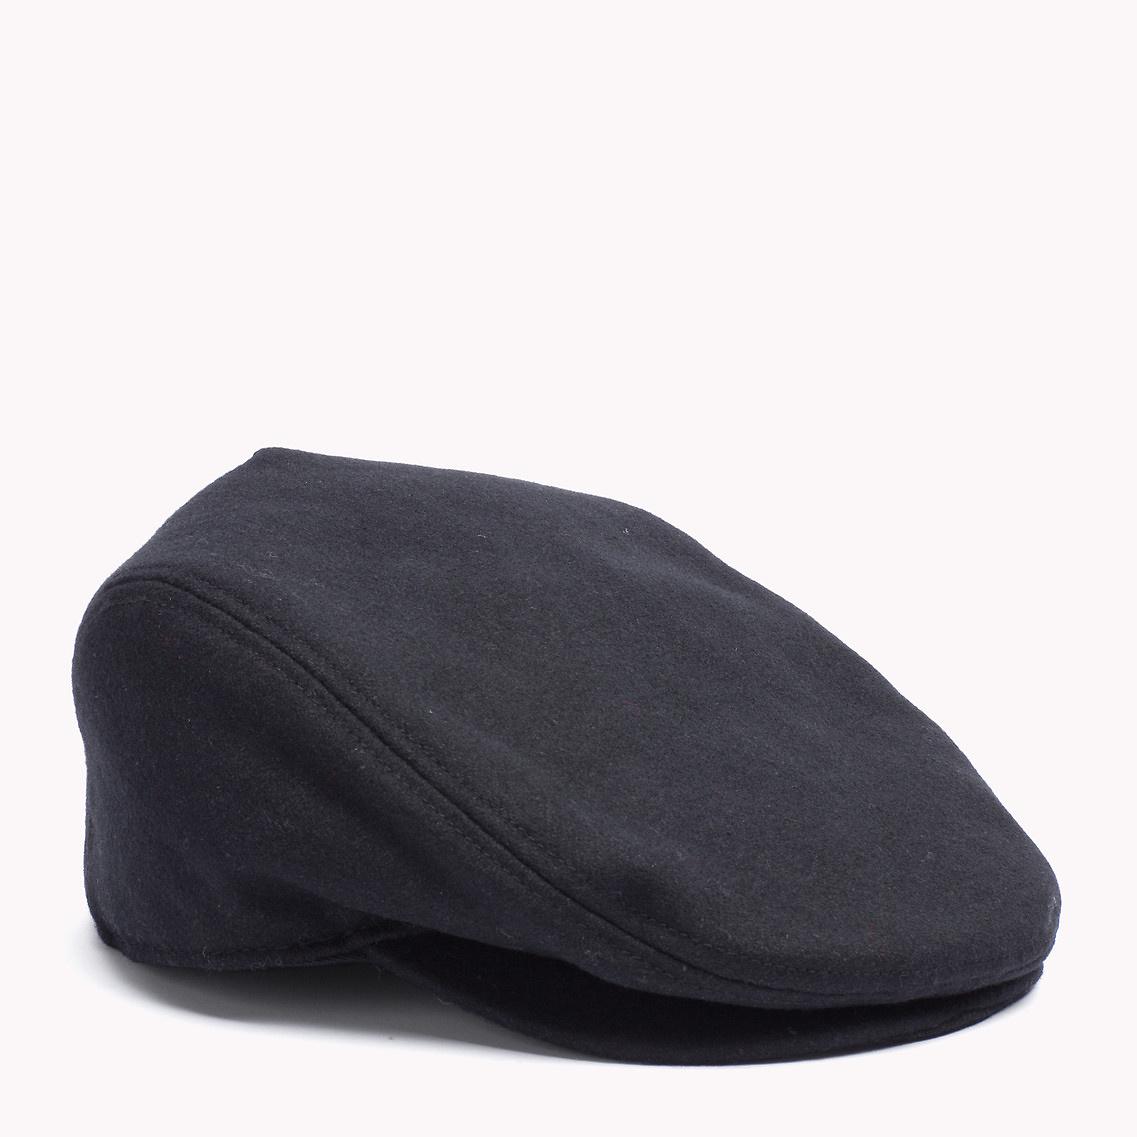 514f25e230f25 Tommy Hilfiger Wool Blend Cap in Black for Men - Lyst